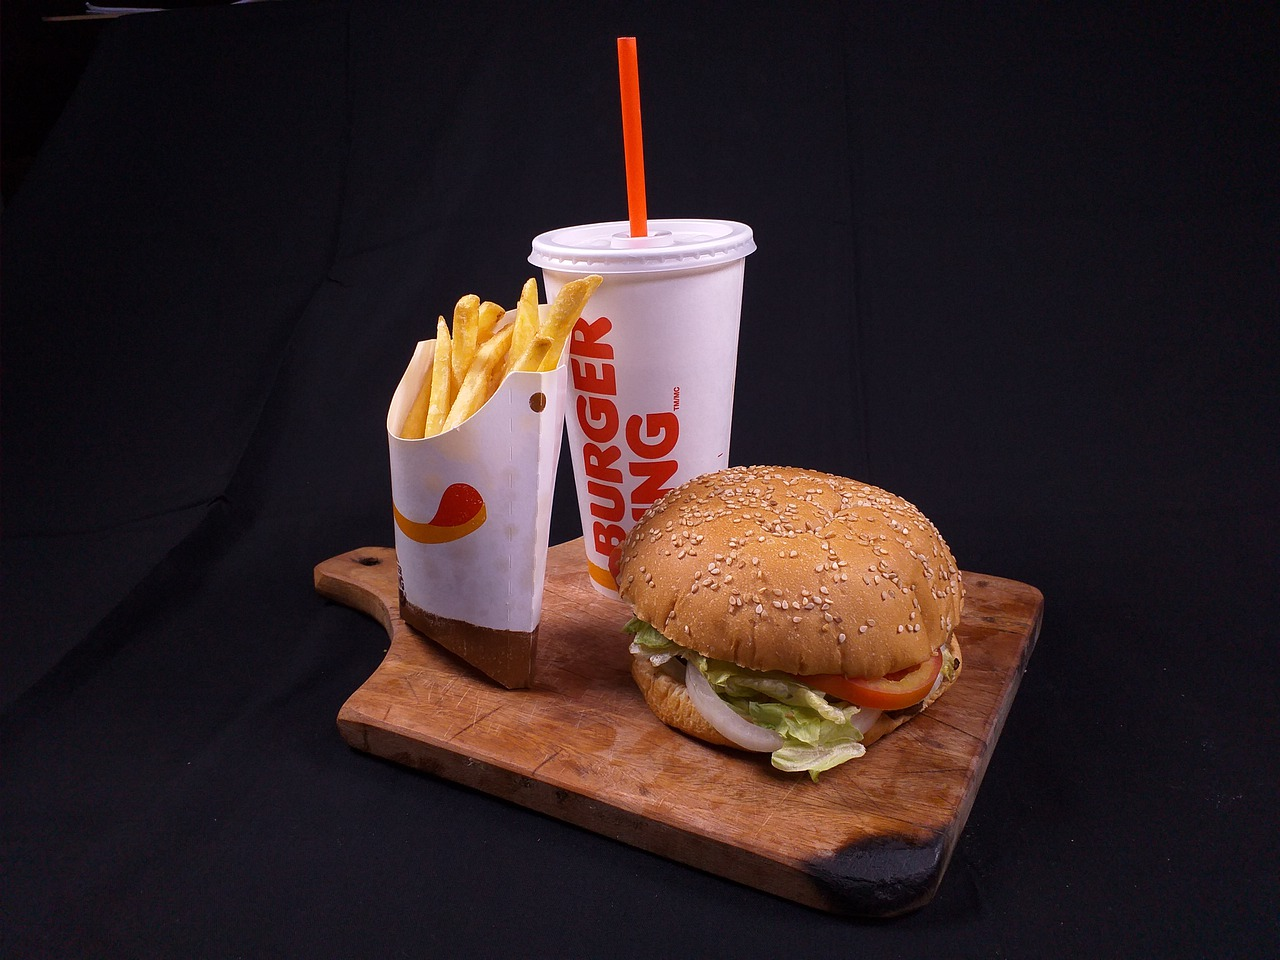 vaccini burger king